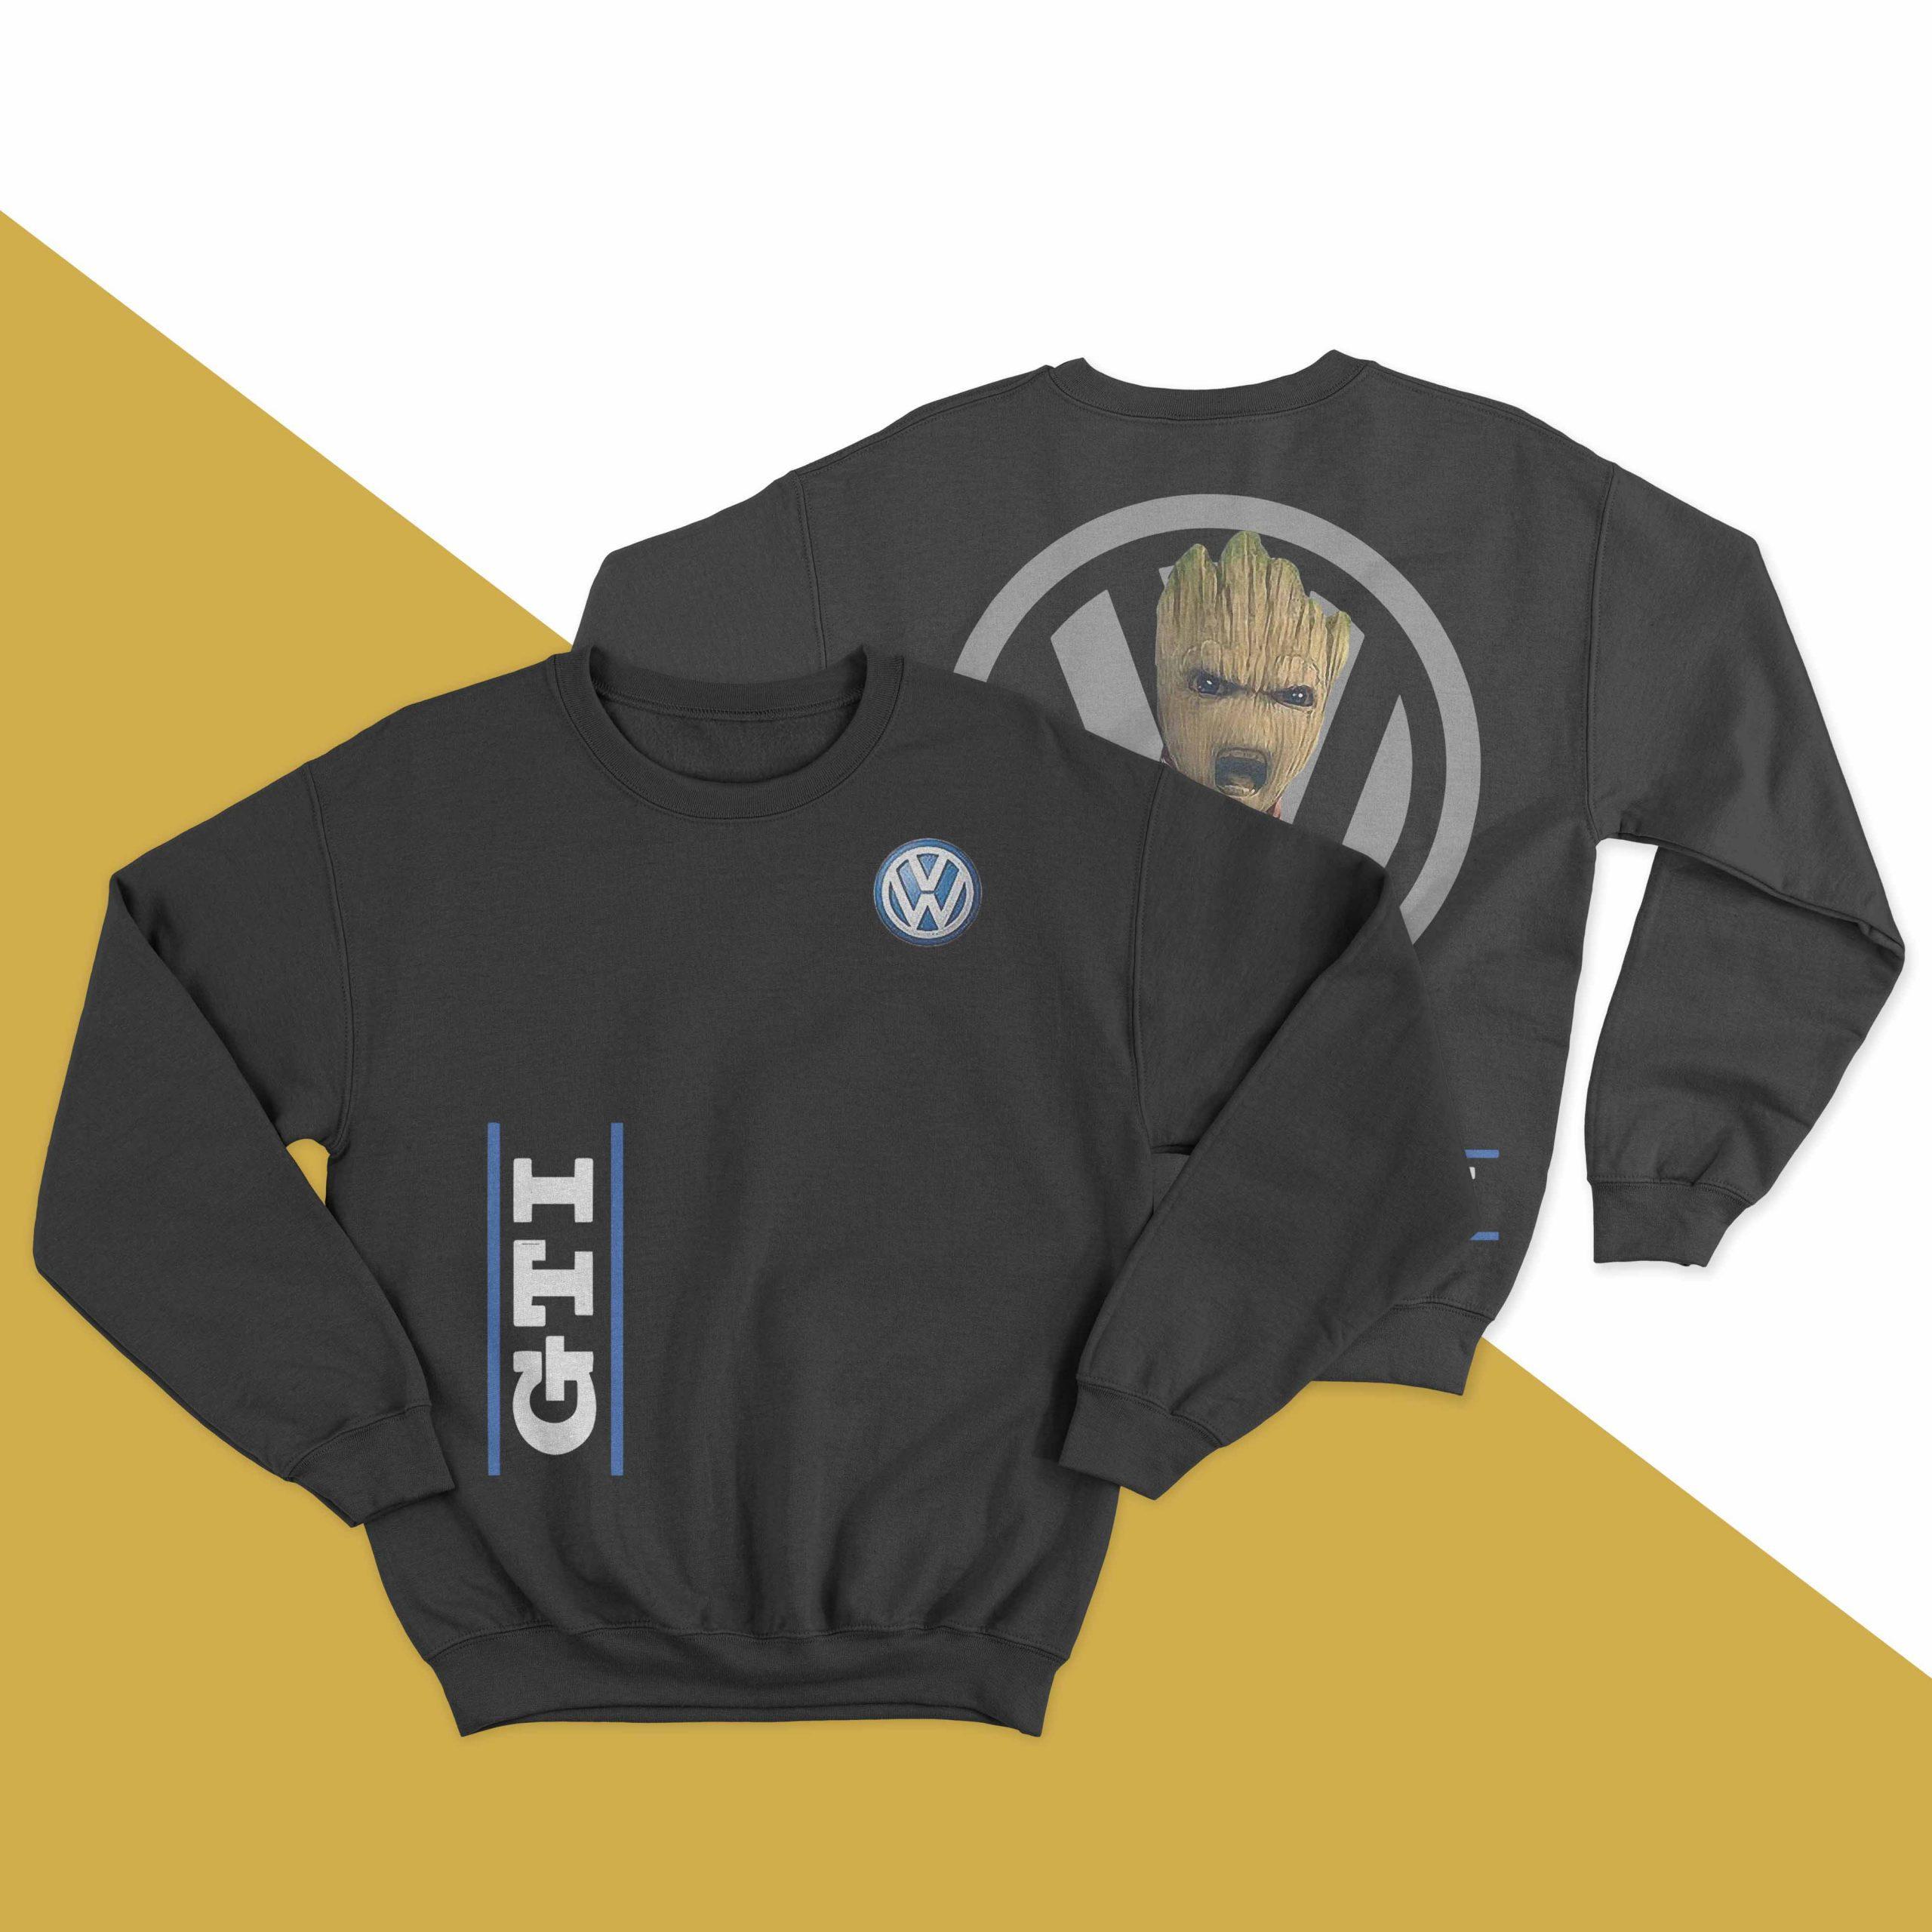 Baby Groot Gti Sweater